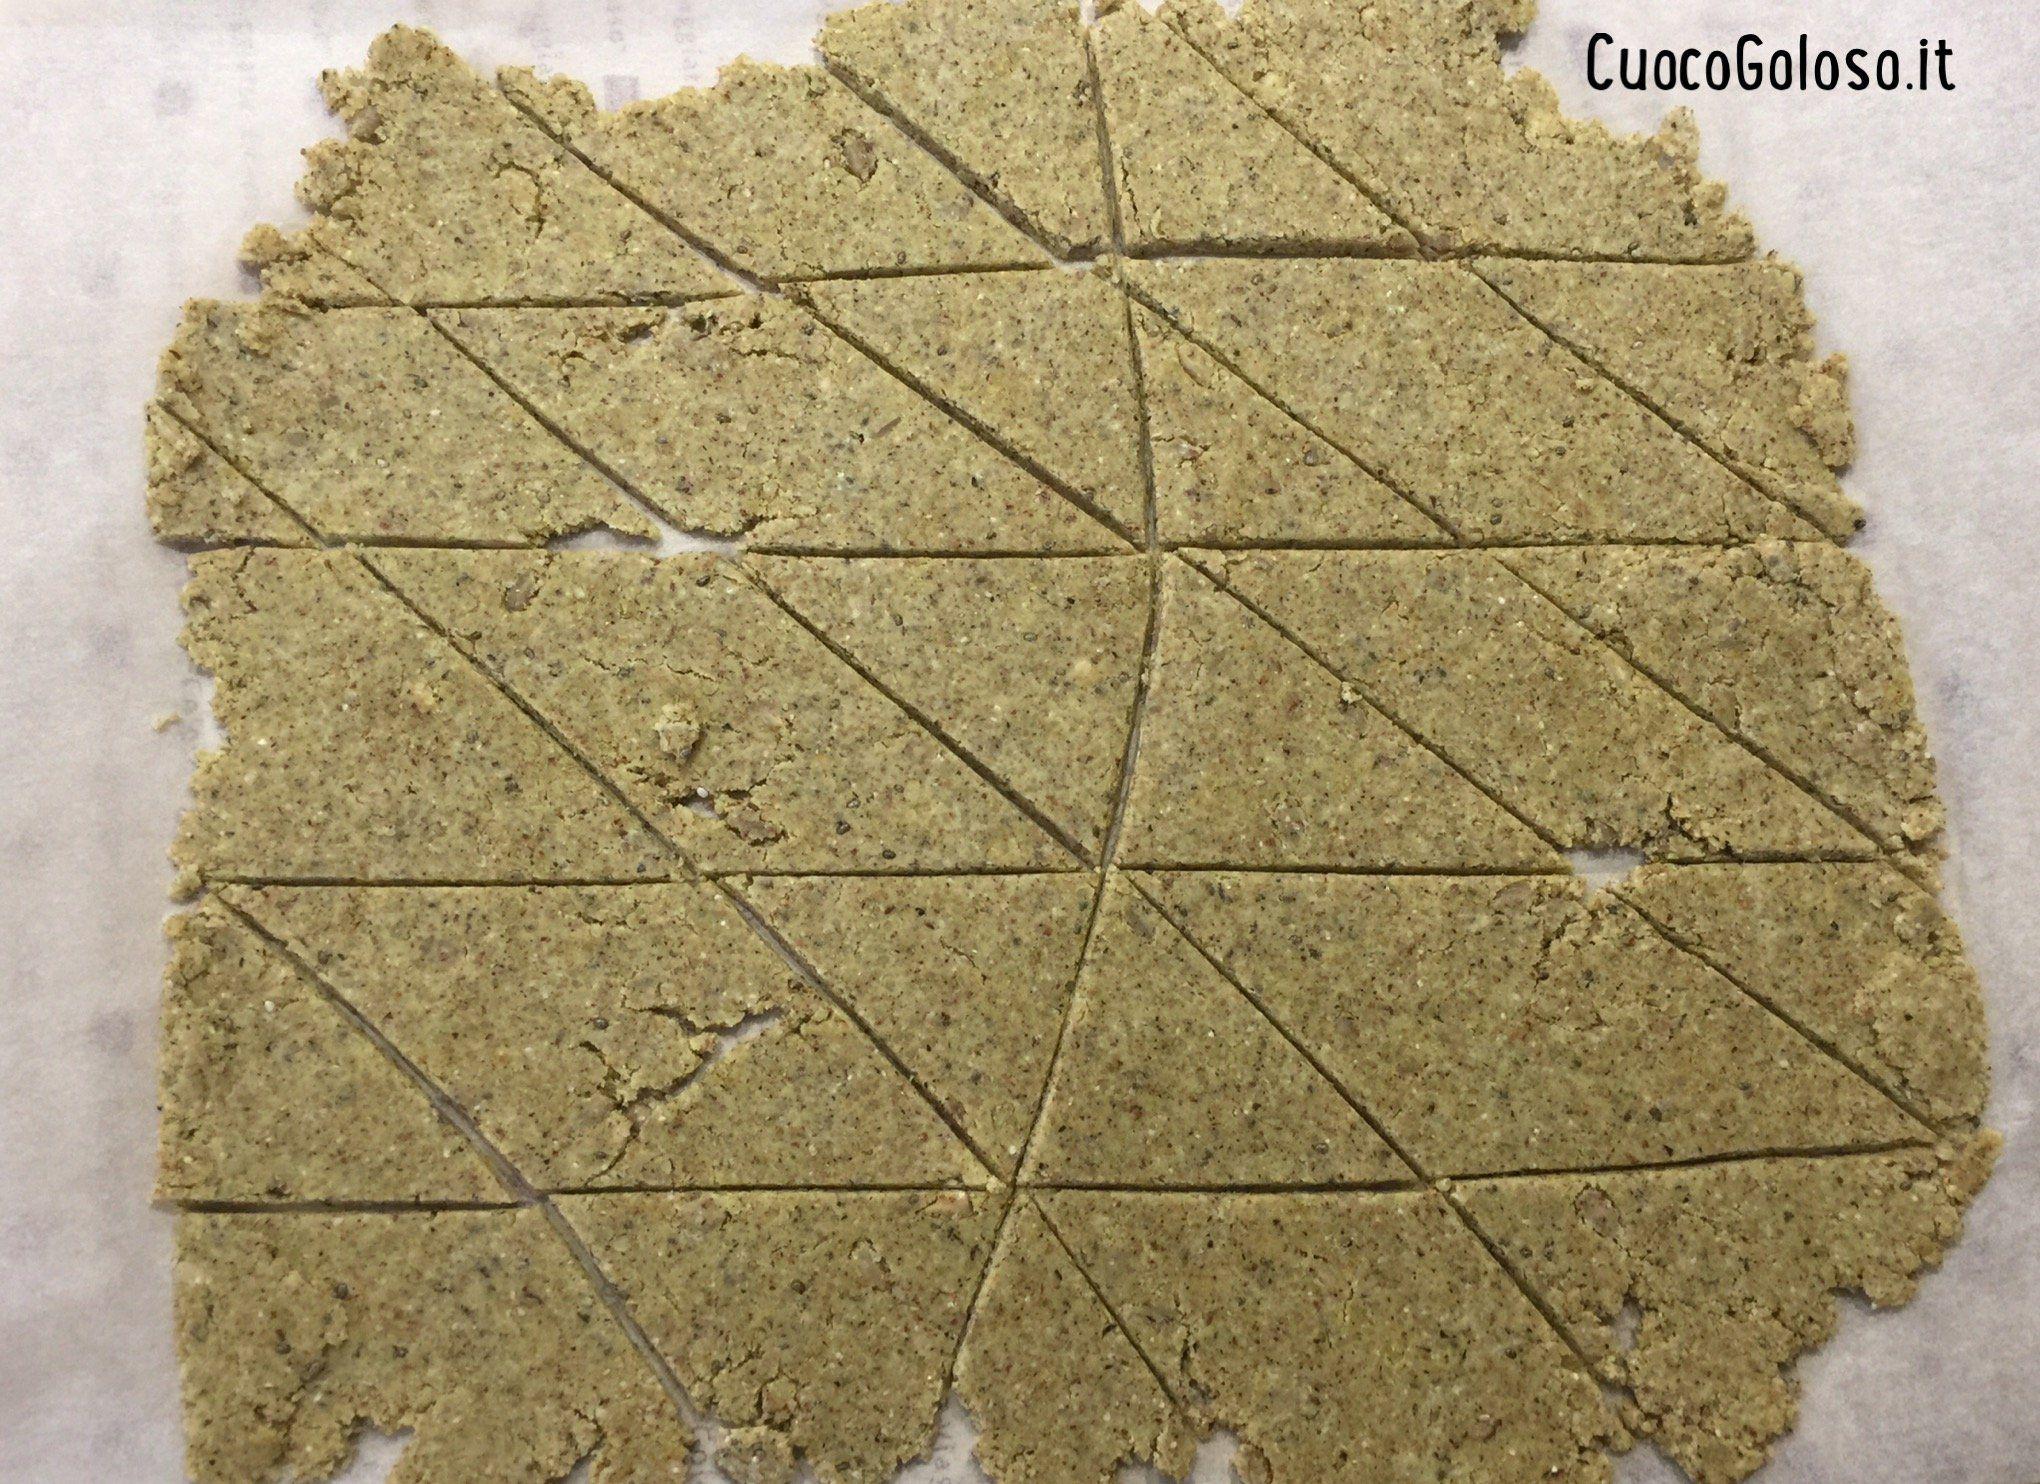 D67D8E15-CF46-4C85-97CF-8E58F2AA67D0 Crackers di Grano Saraceno e Mandorle senza Glutine